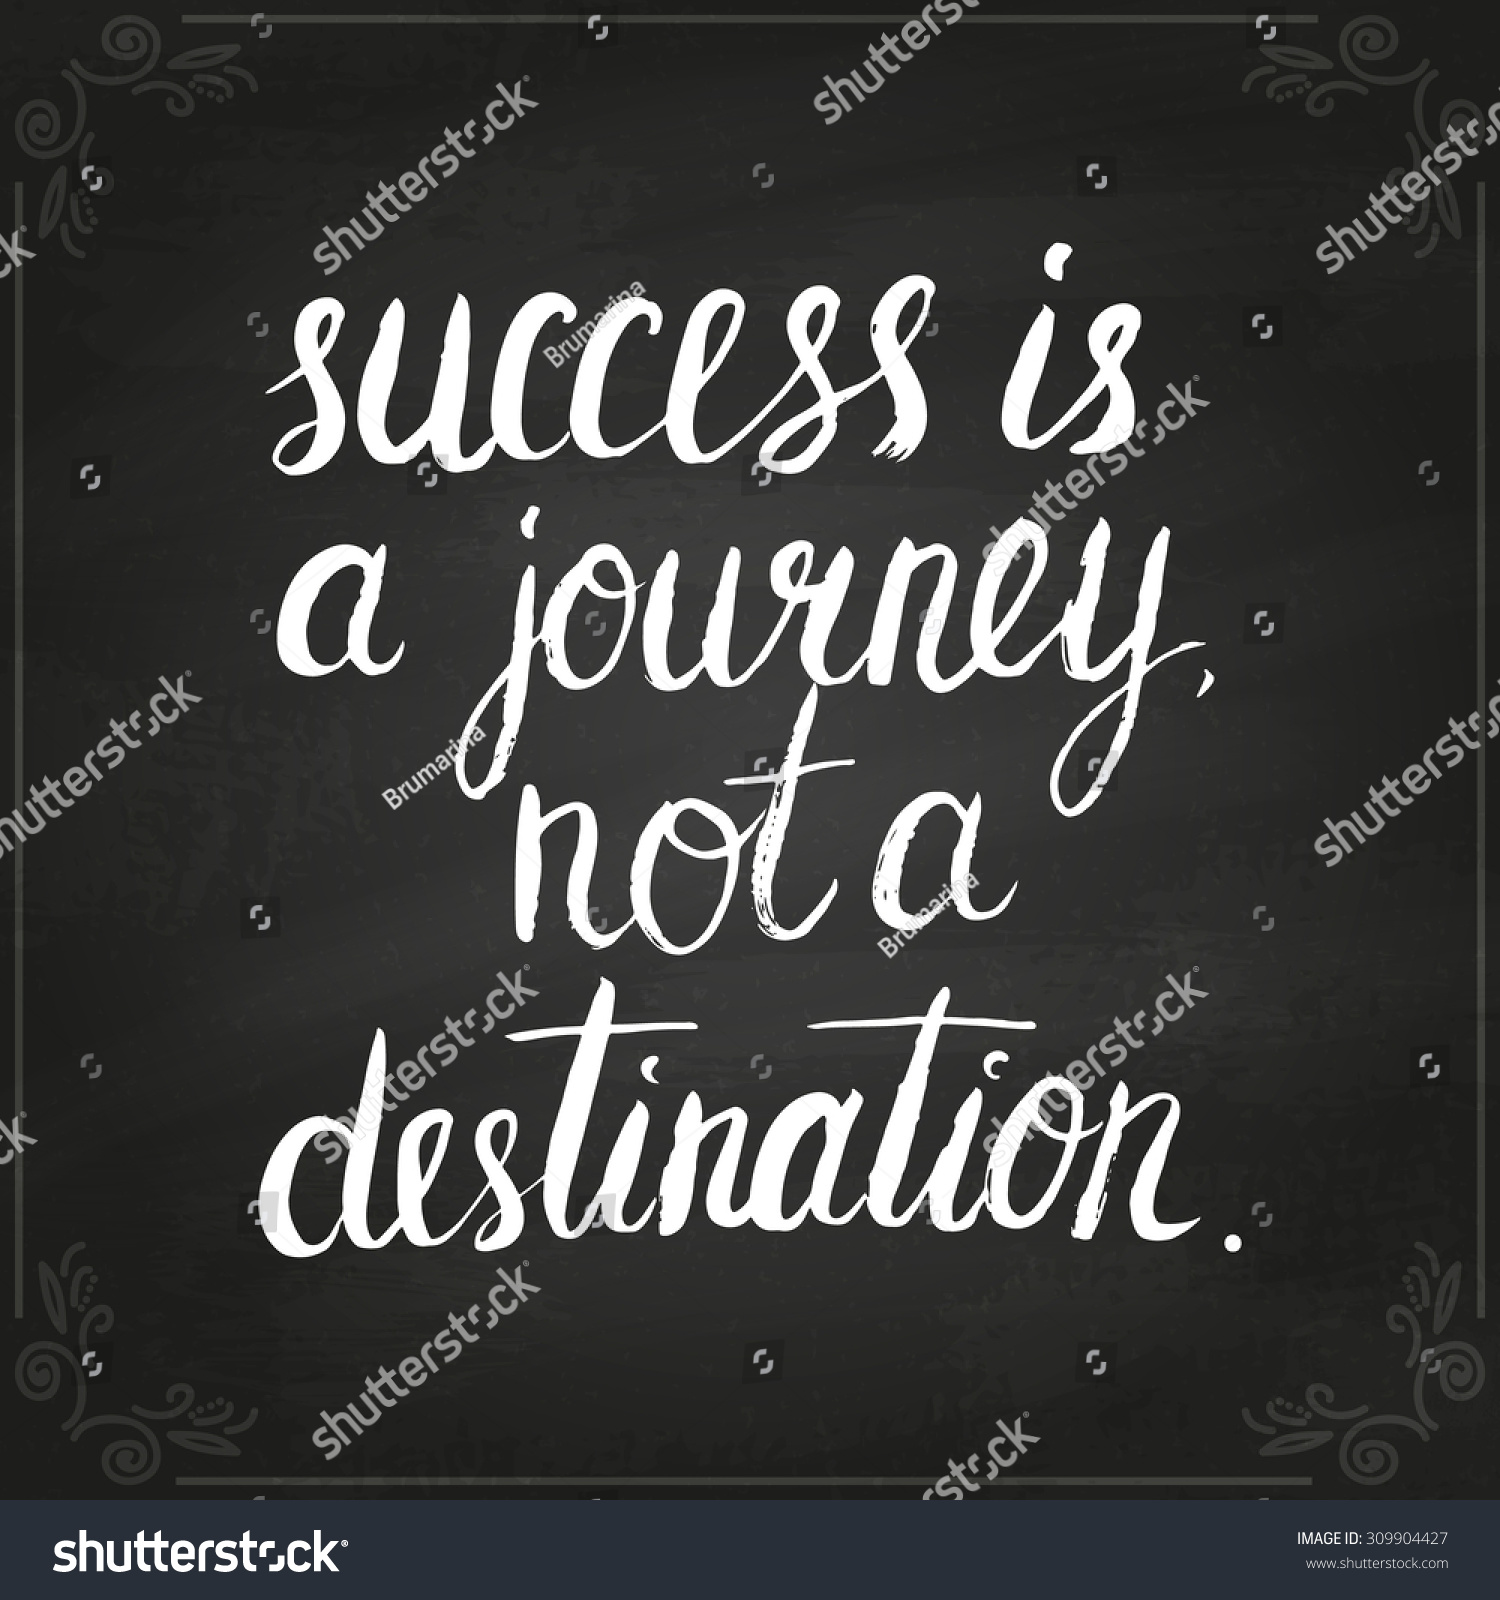 essay on success is a journey not a destination